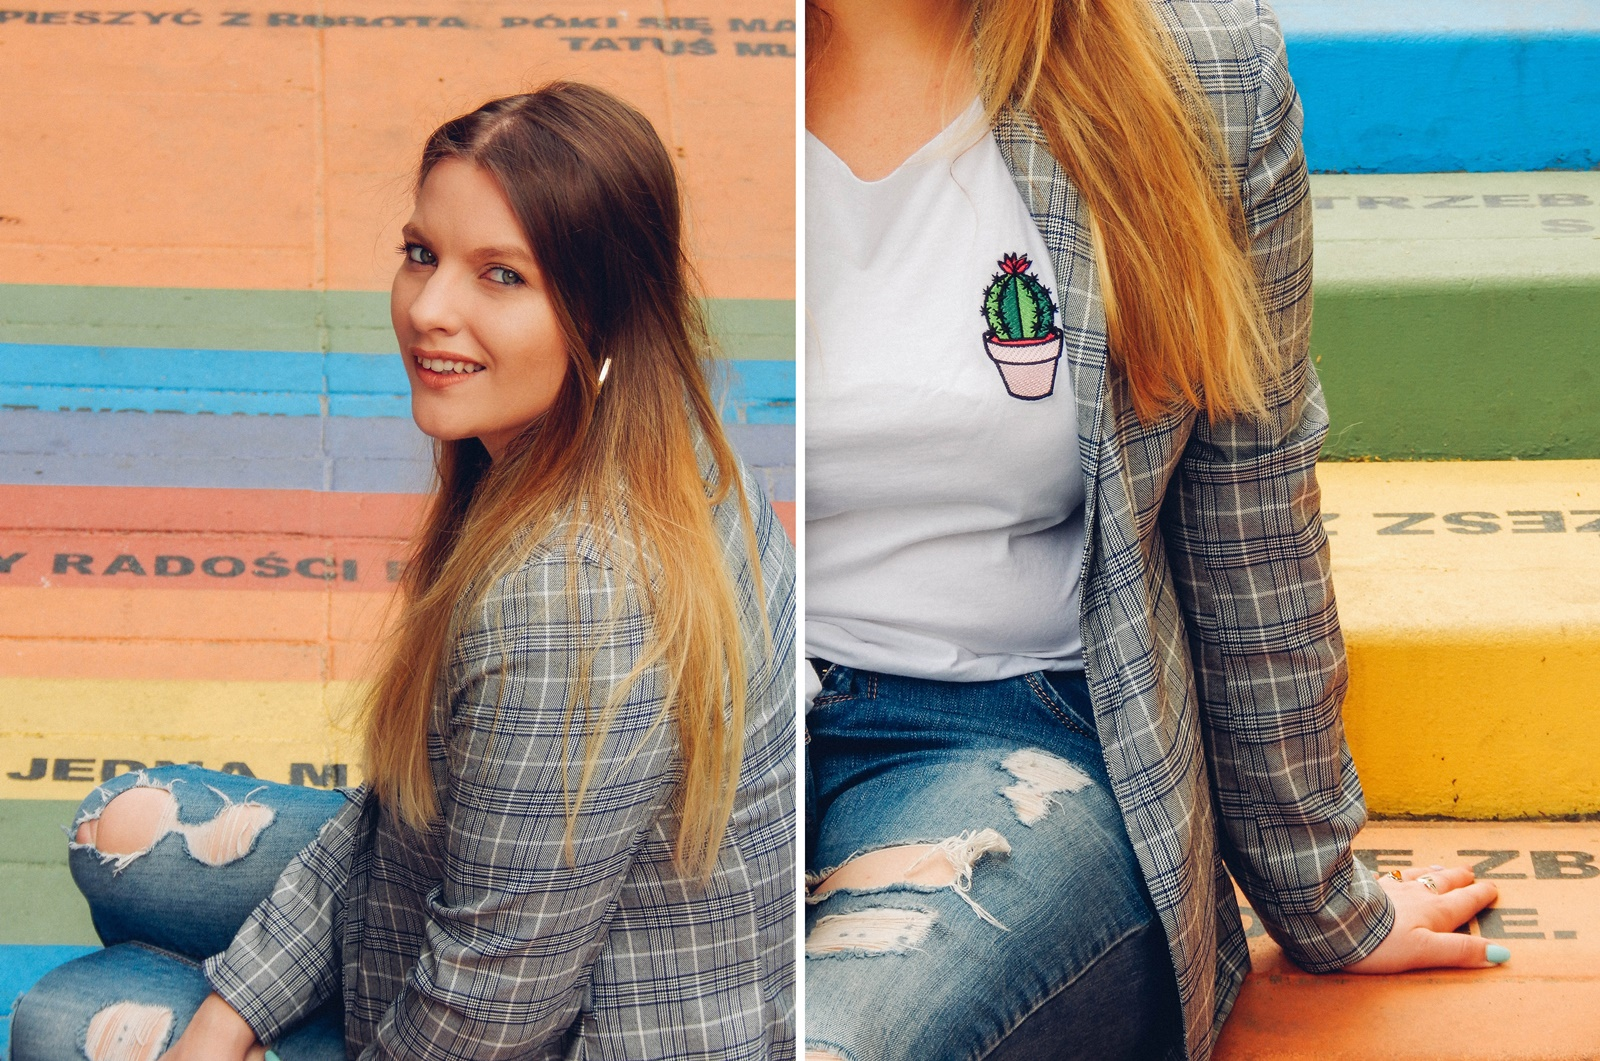 6a nakd zniżka outfit moda blog modowy jak nosić marynarkę w kratkę tshirt z kaktusem jak nosić podarte jeansy vansy moda streetwear style fashion outfit blog lifestyle łódź